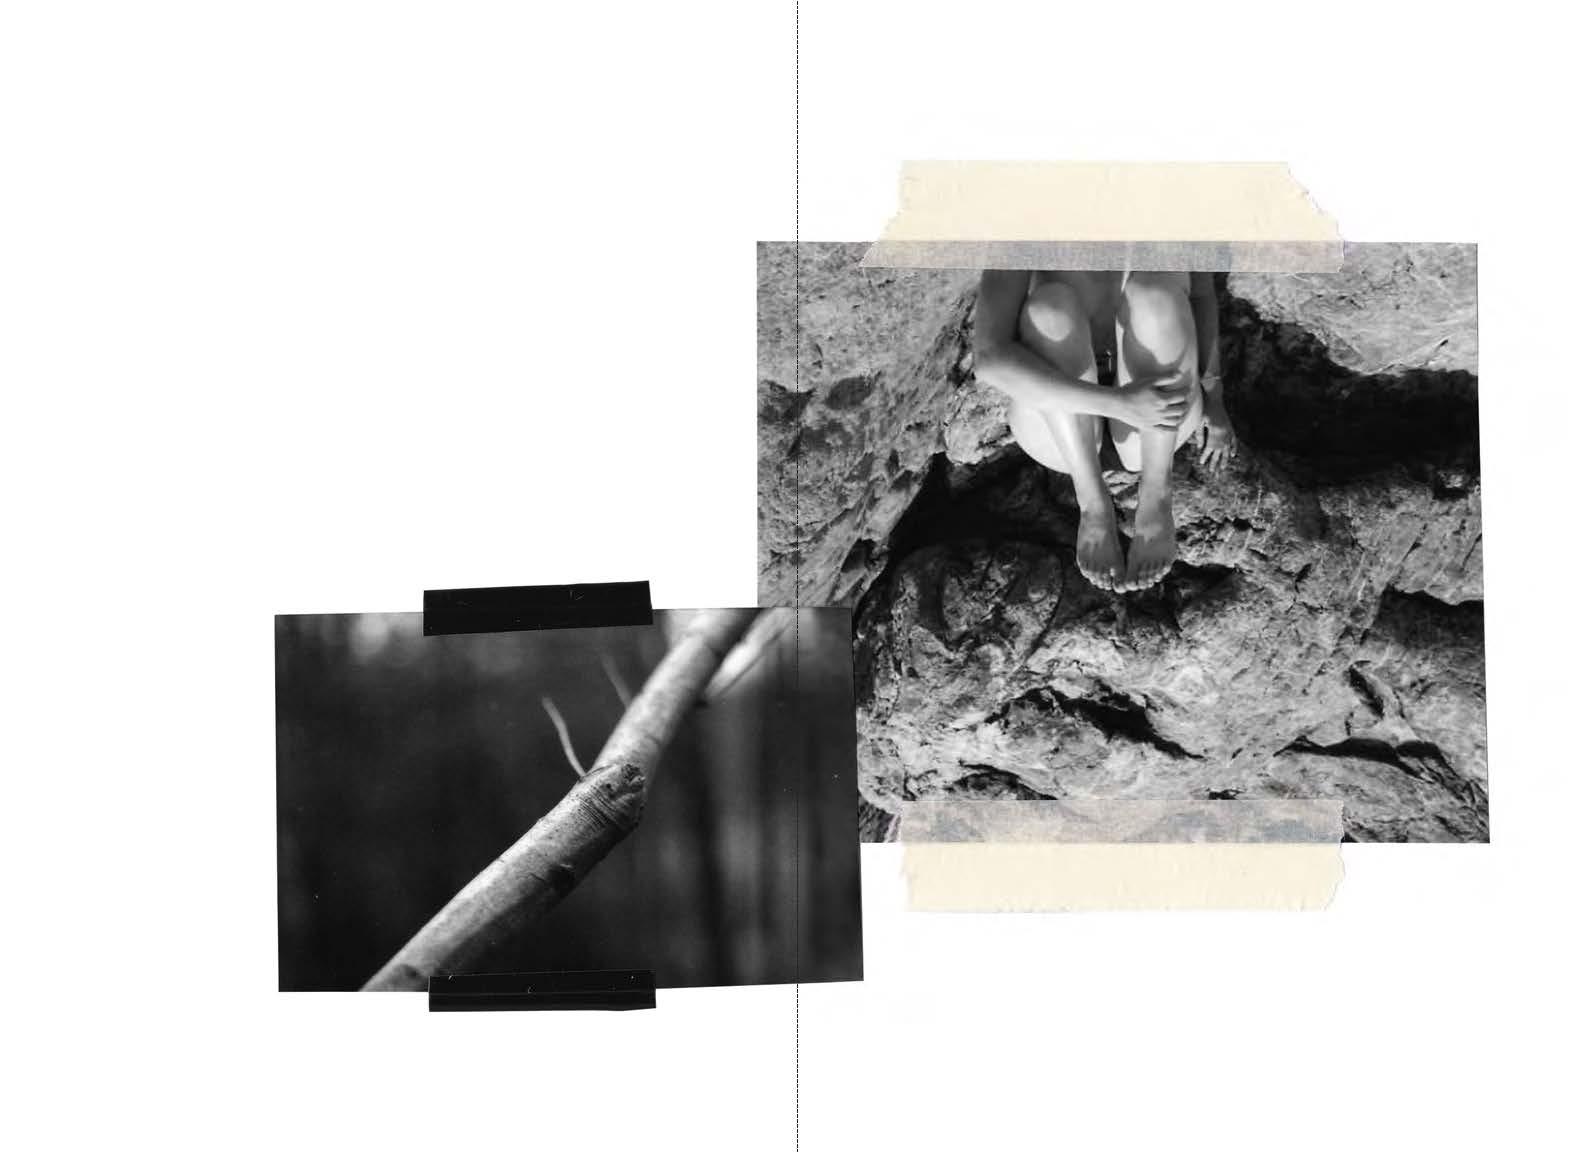 Manuscript-Selfie-YildauterBeek-Lang_Pagina_45.jpg